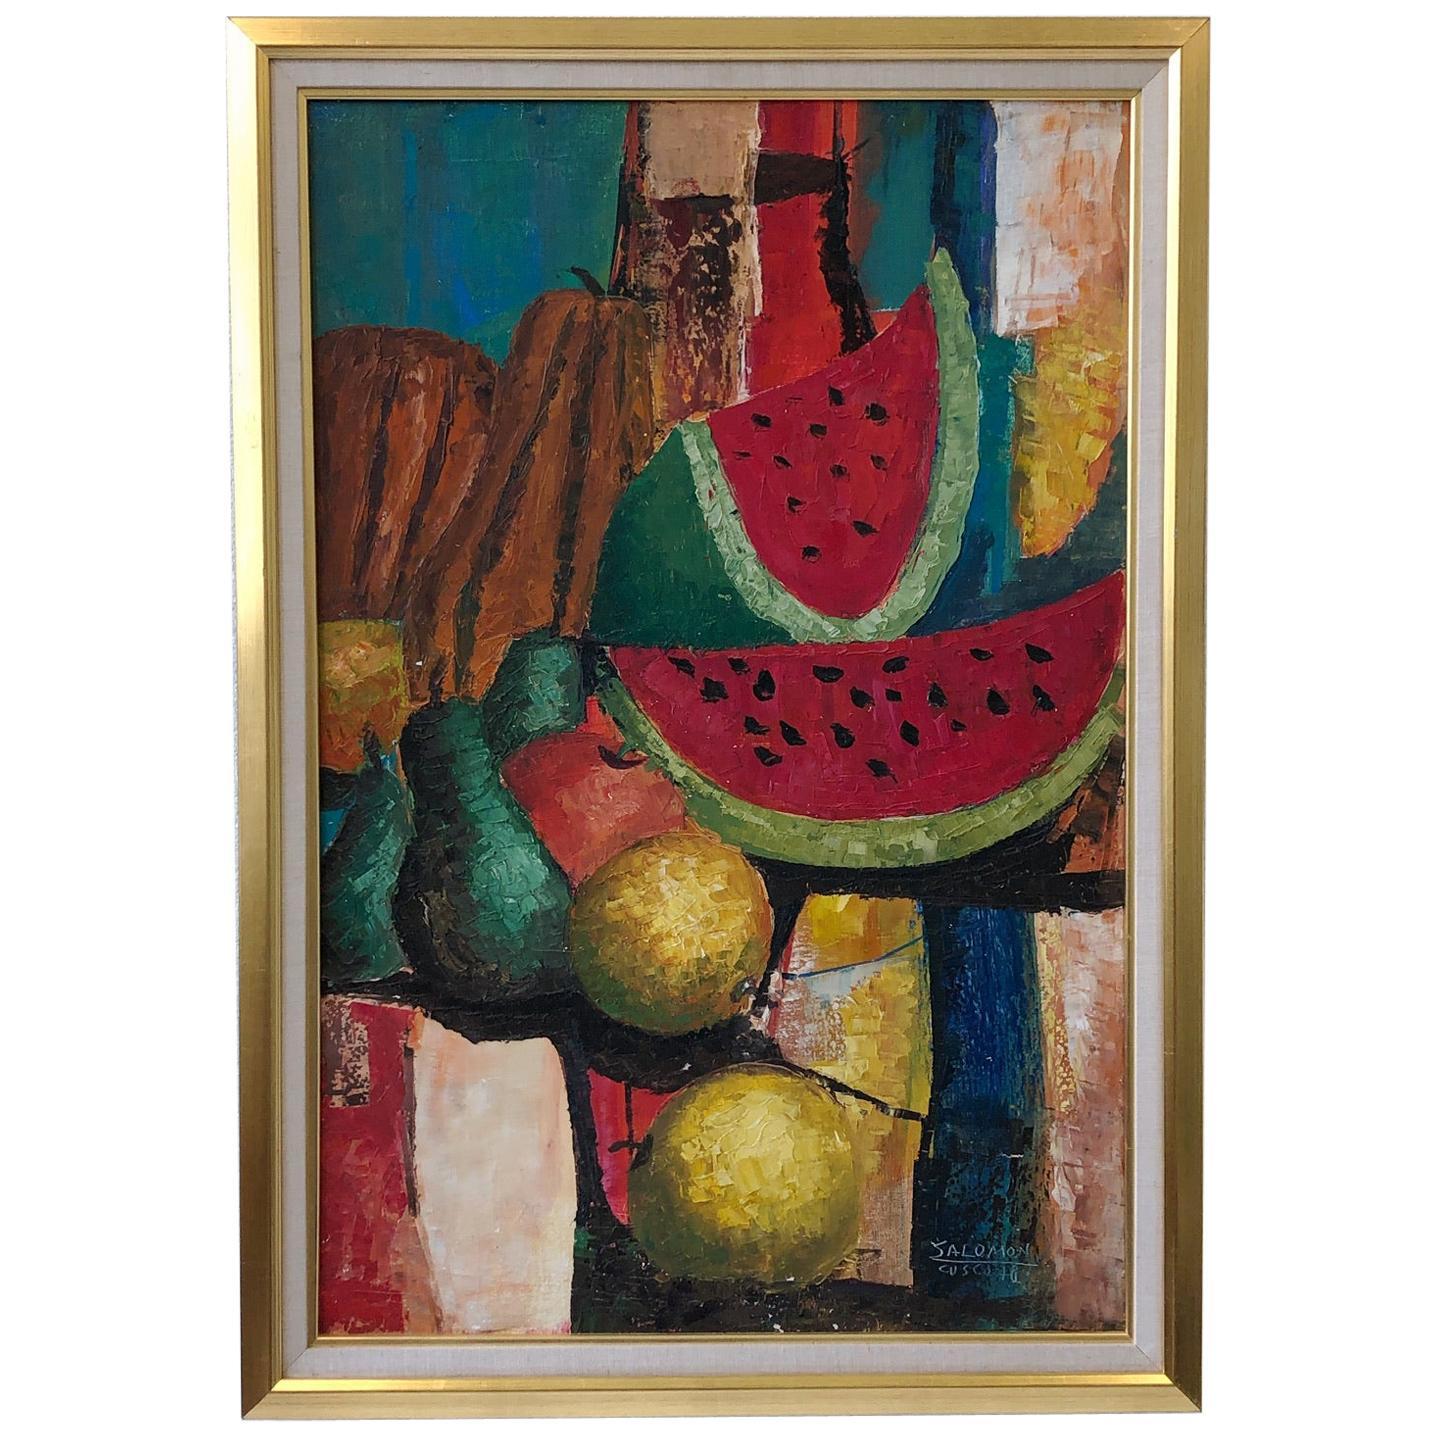 Still Life Oil Painting by Listed Artists Almicar Salomon Zorrilla